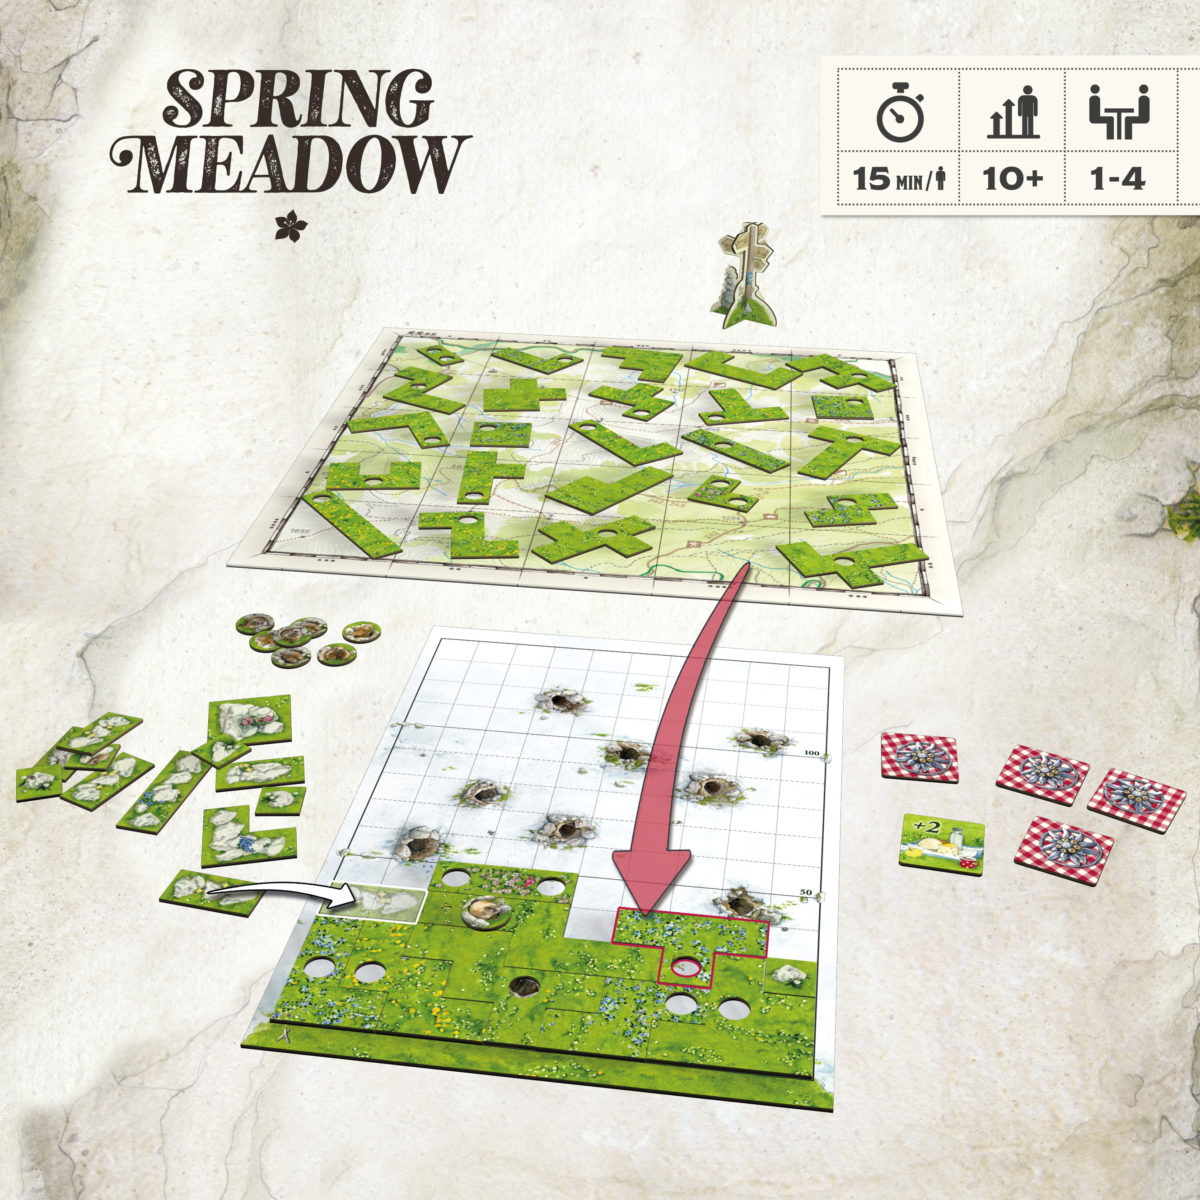 SpringMeadow_Szene